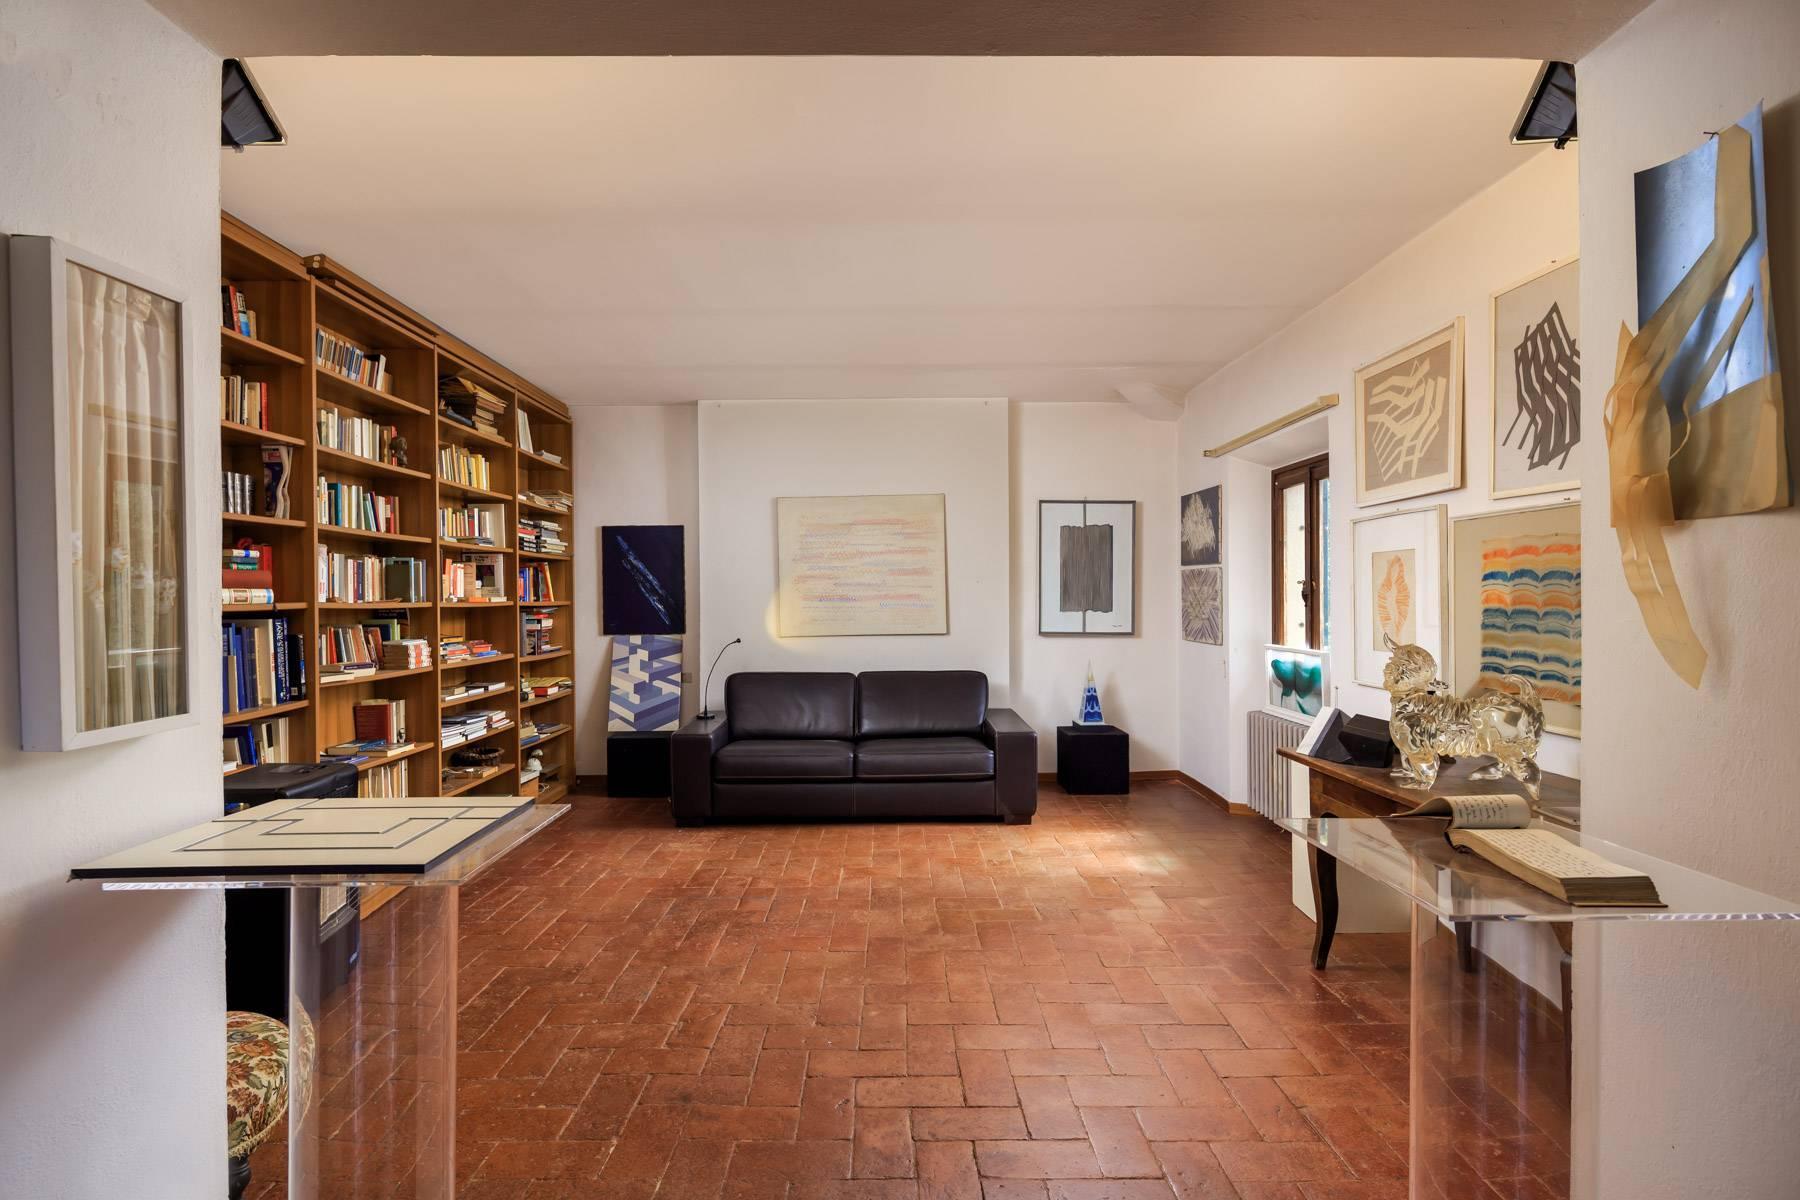 Diana Baylons Haus-Museum - 15